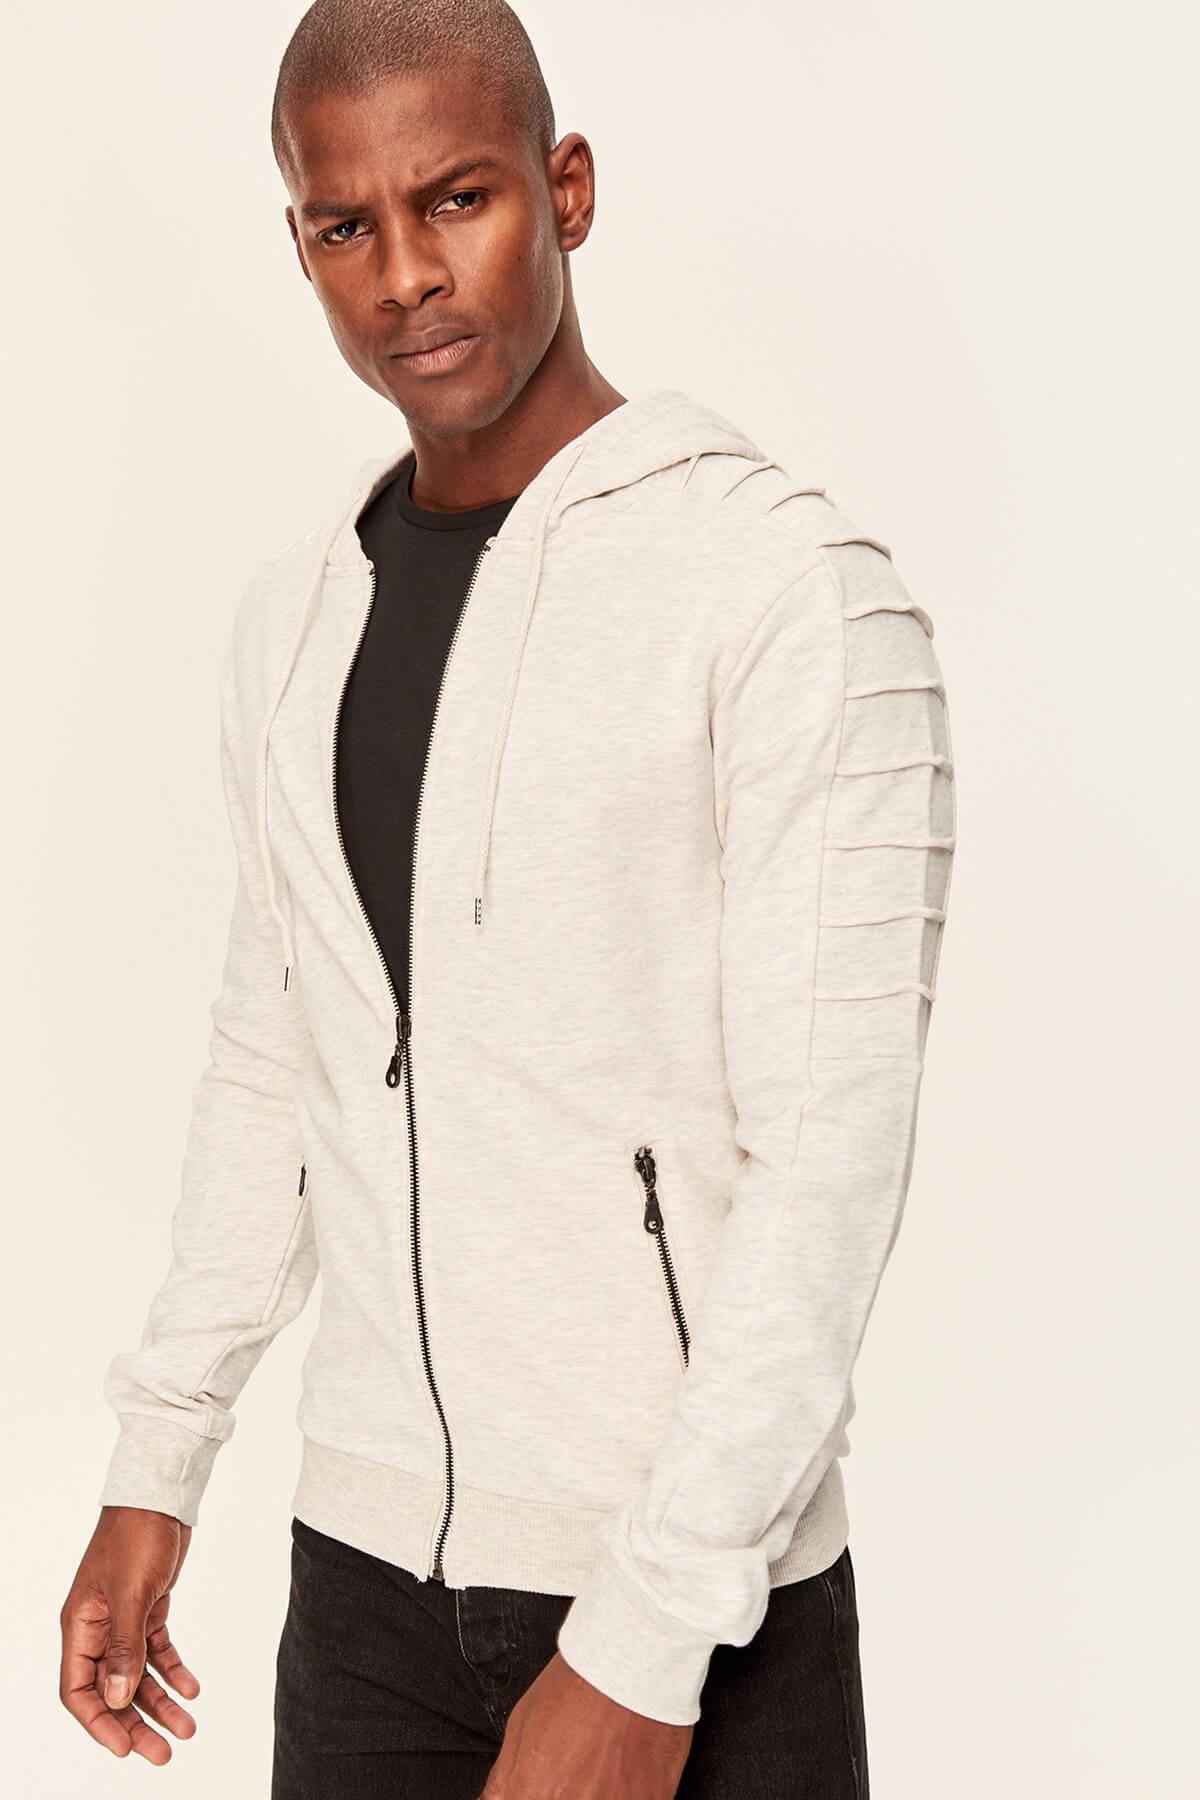 Trendyol Stone Men's Sweatshirts-Hooded Zippered Arm Ribbed